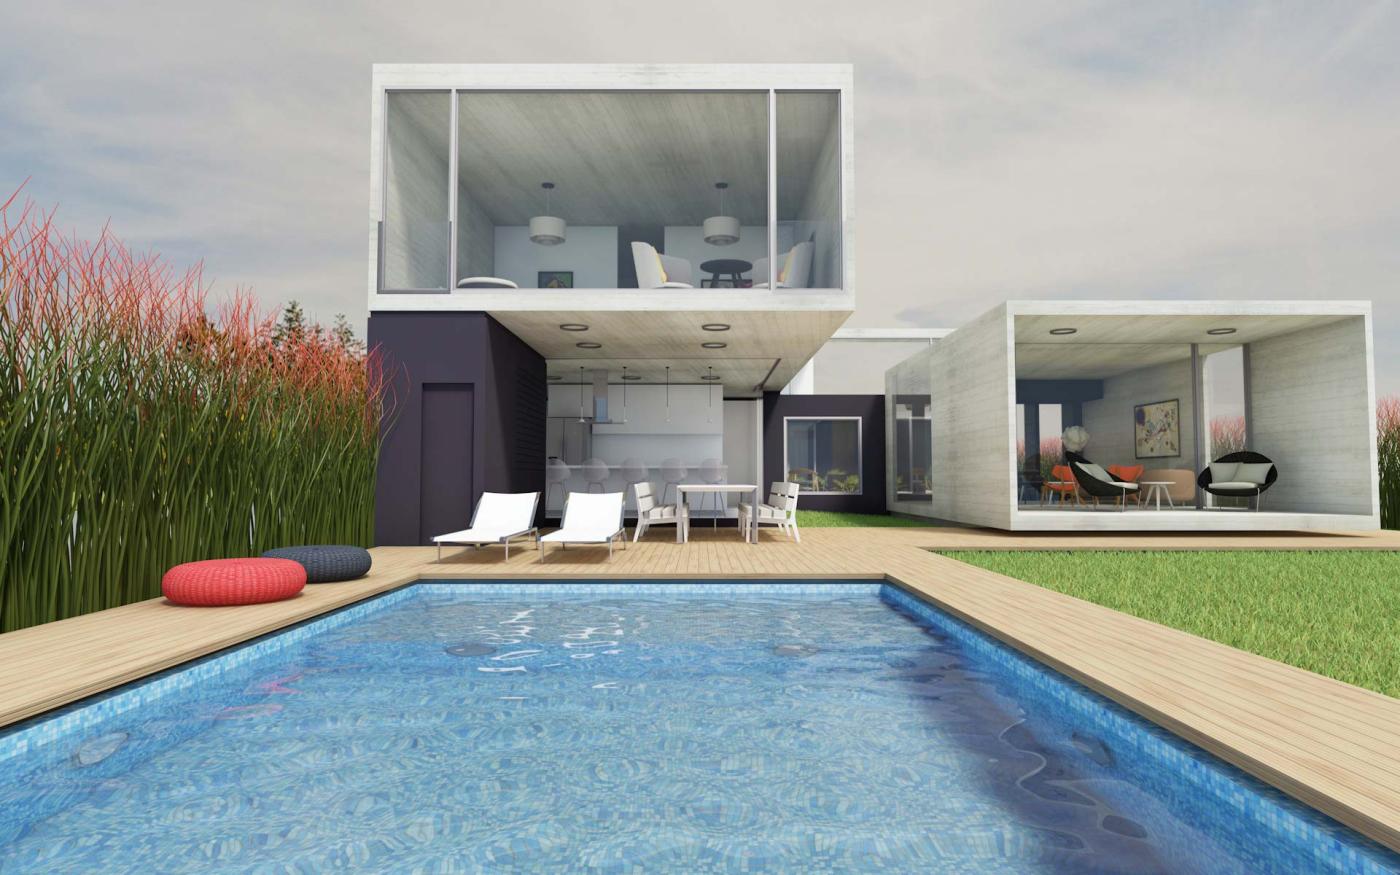 Casa tttbn vivienda en barrio privado najmias oficina for Fotos de disenos de piletas de natacion